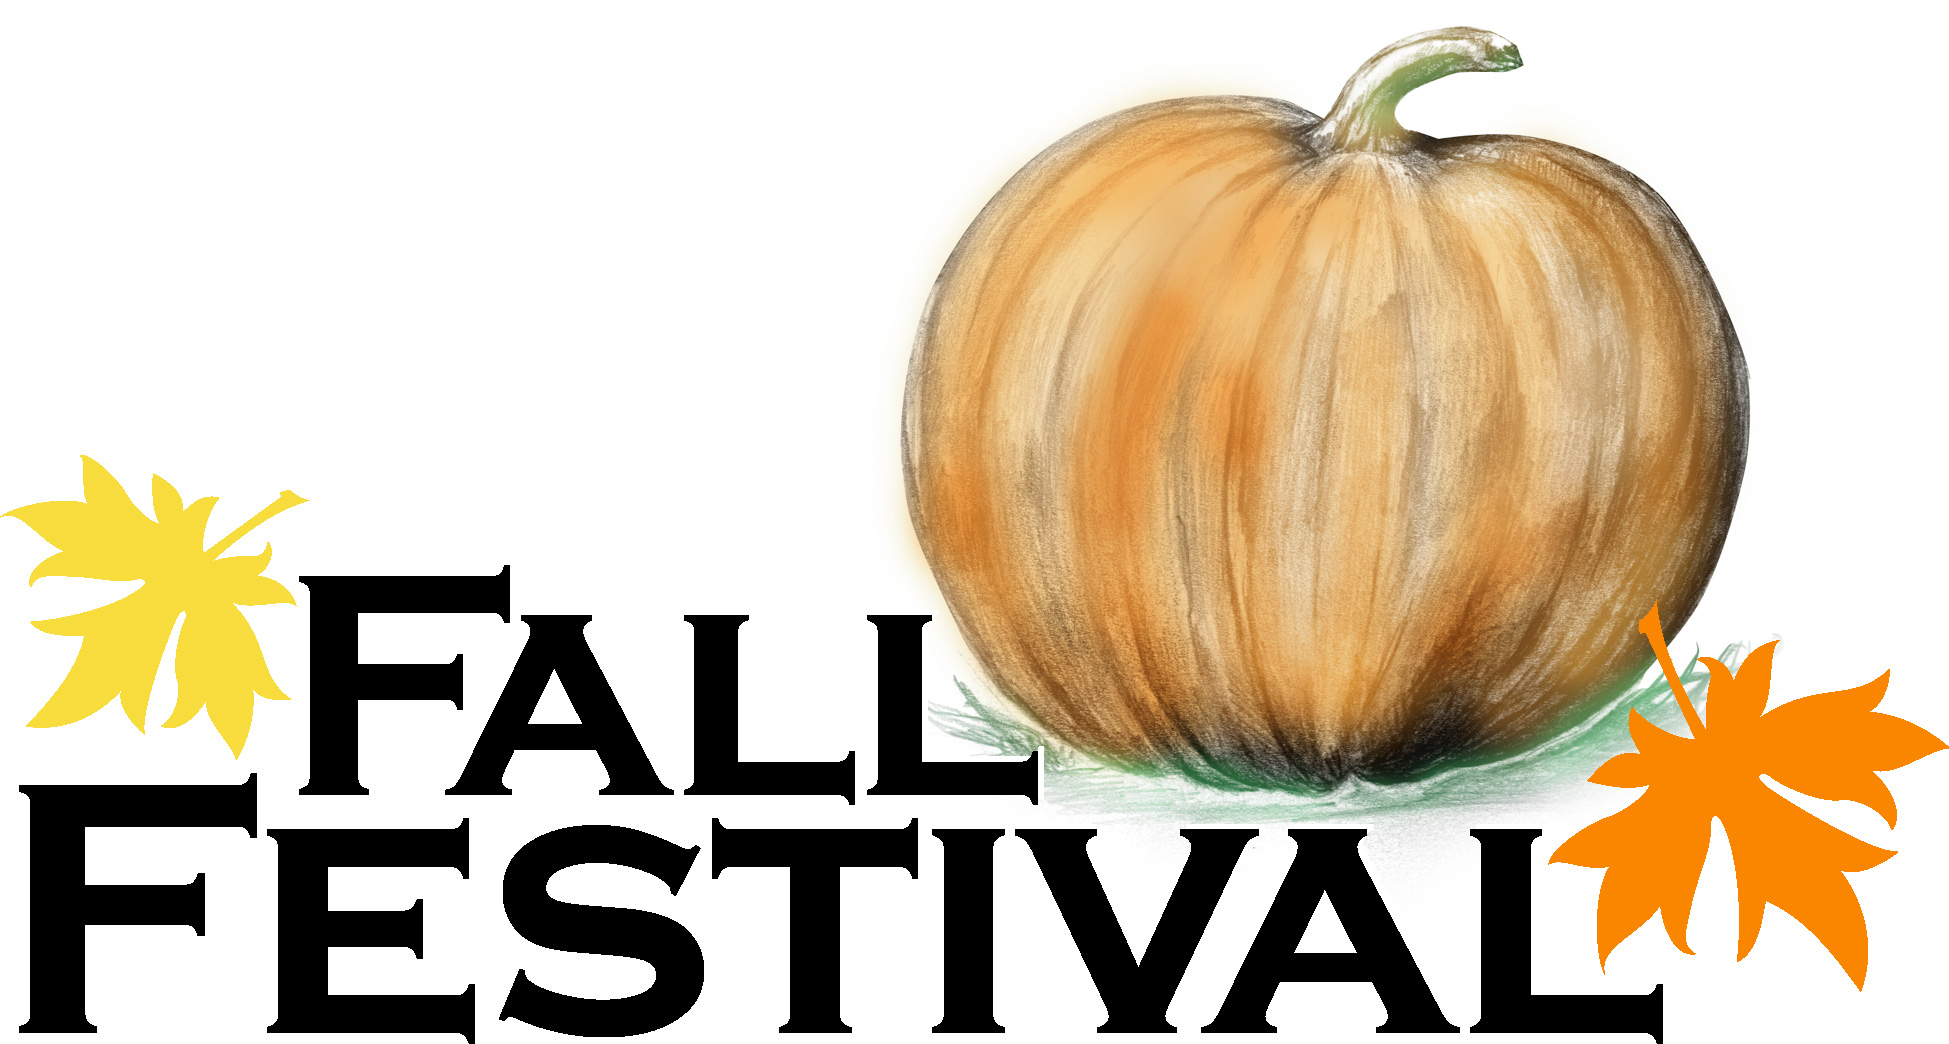 Fall Festival Fall Family .-Fall festival fall family .-9